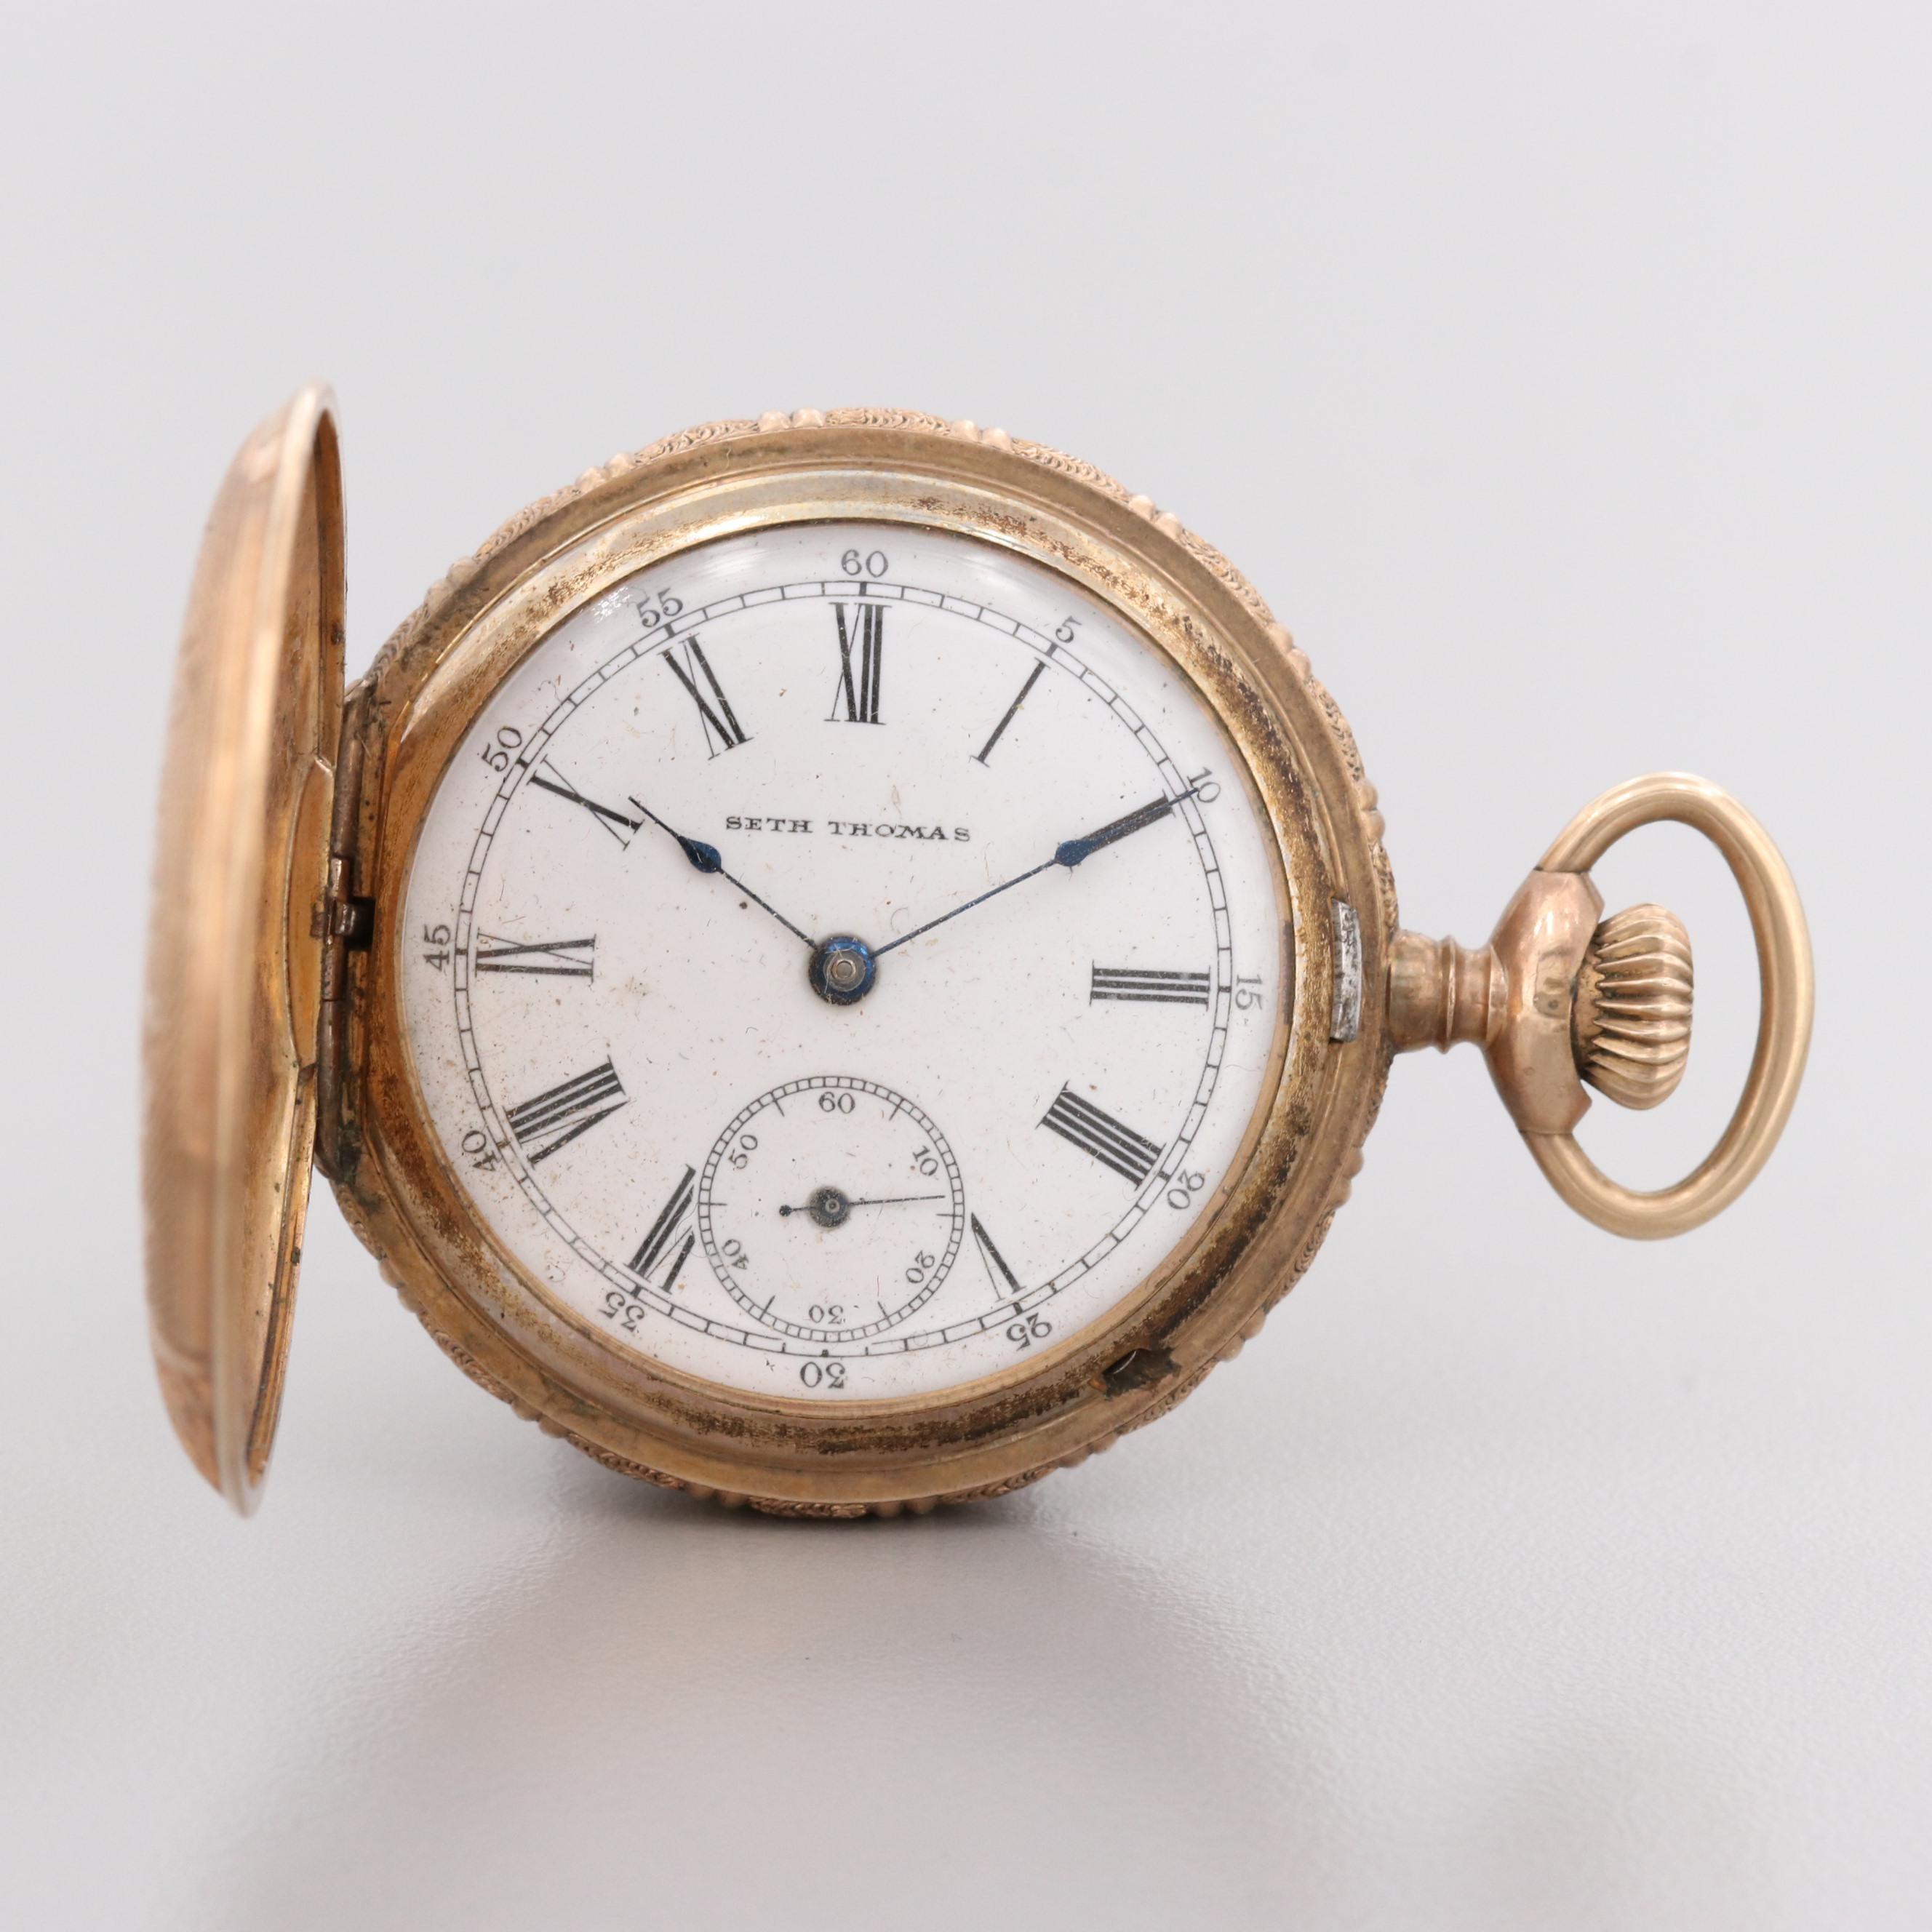 Seth Thomas Gold Filled Pocket Watch